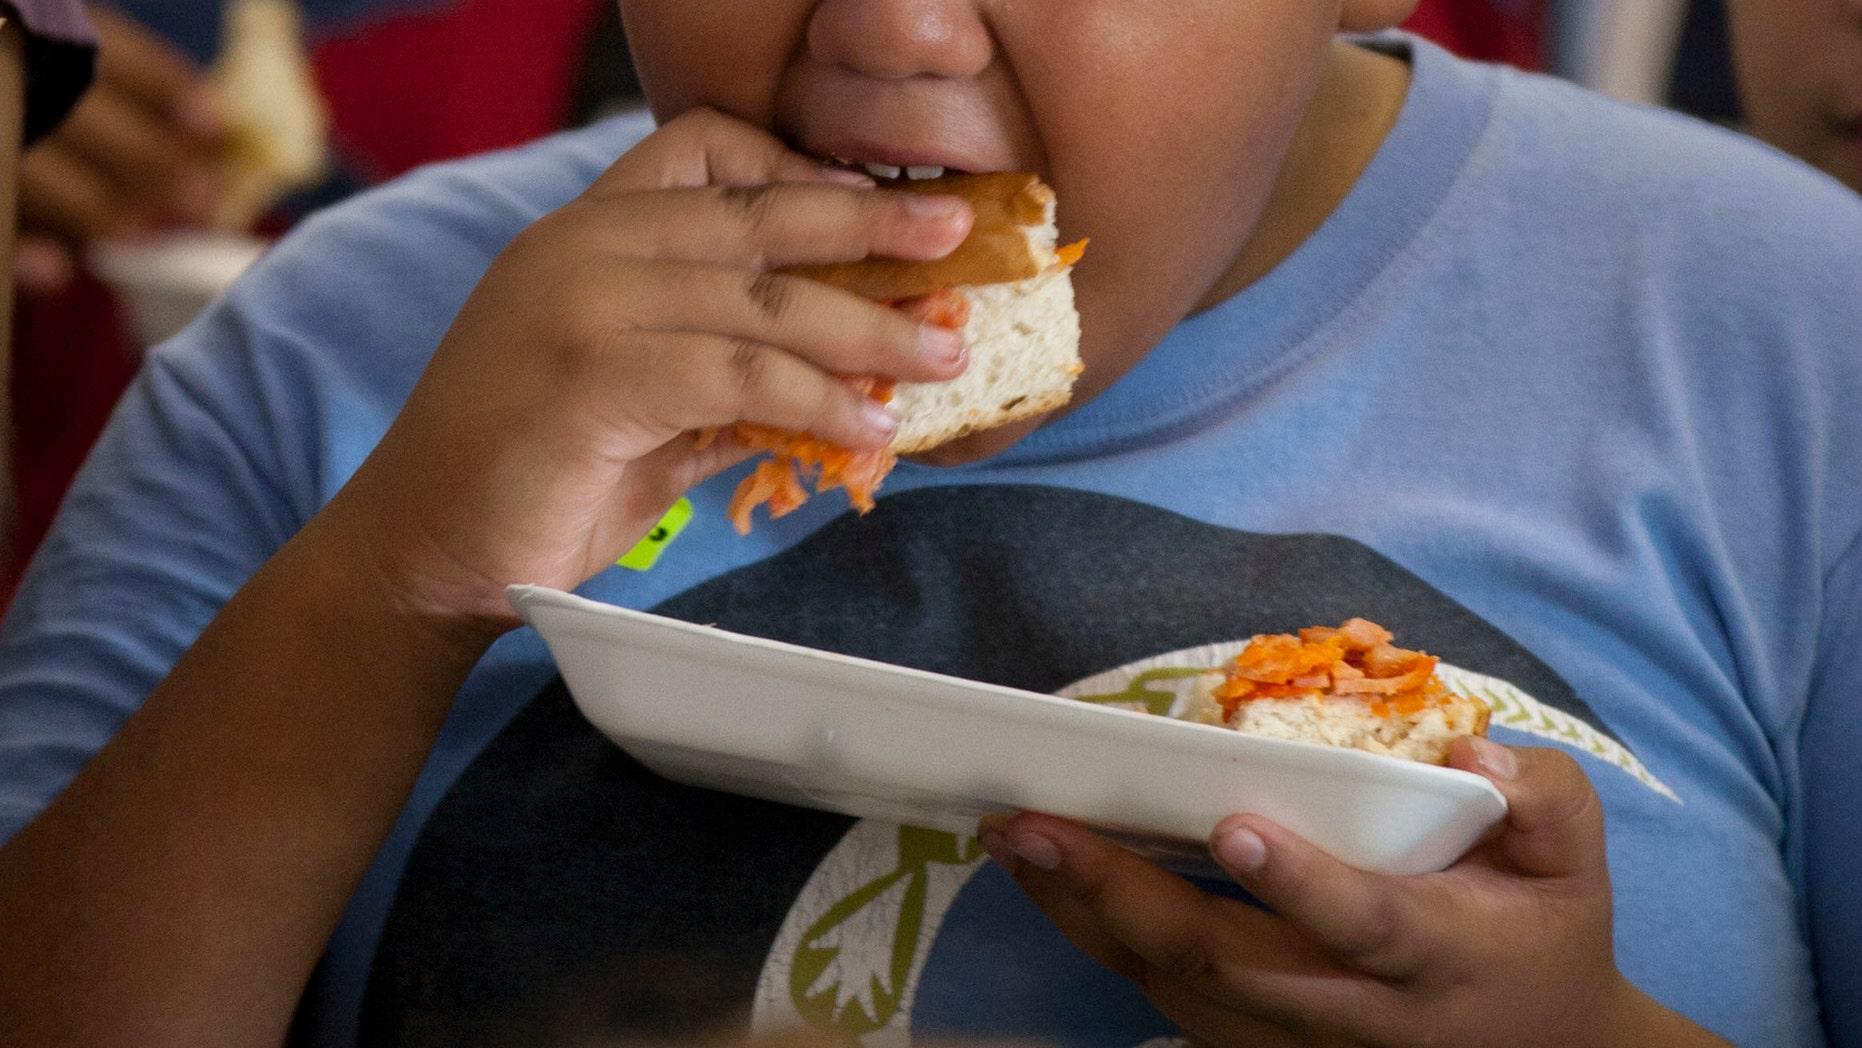 "A boy eats a piece of a ""mega torta"" sandwich during a Torta Festival in a plaza Mexico City, Wednesday, Aug. 1, 2012. Cooks prepared the 52 meter sandwich during the festival in an attempt to assemble the largest torta in Mexico's history. (AP Photo/Eduardo Verdugo)"